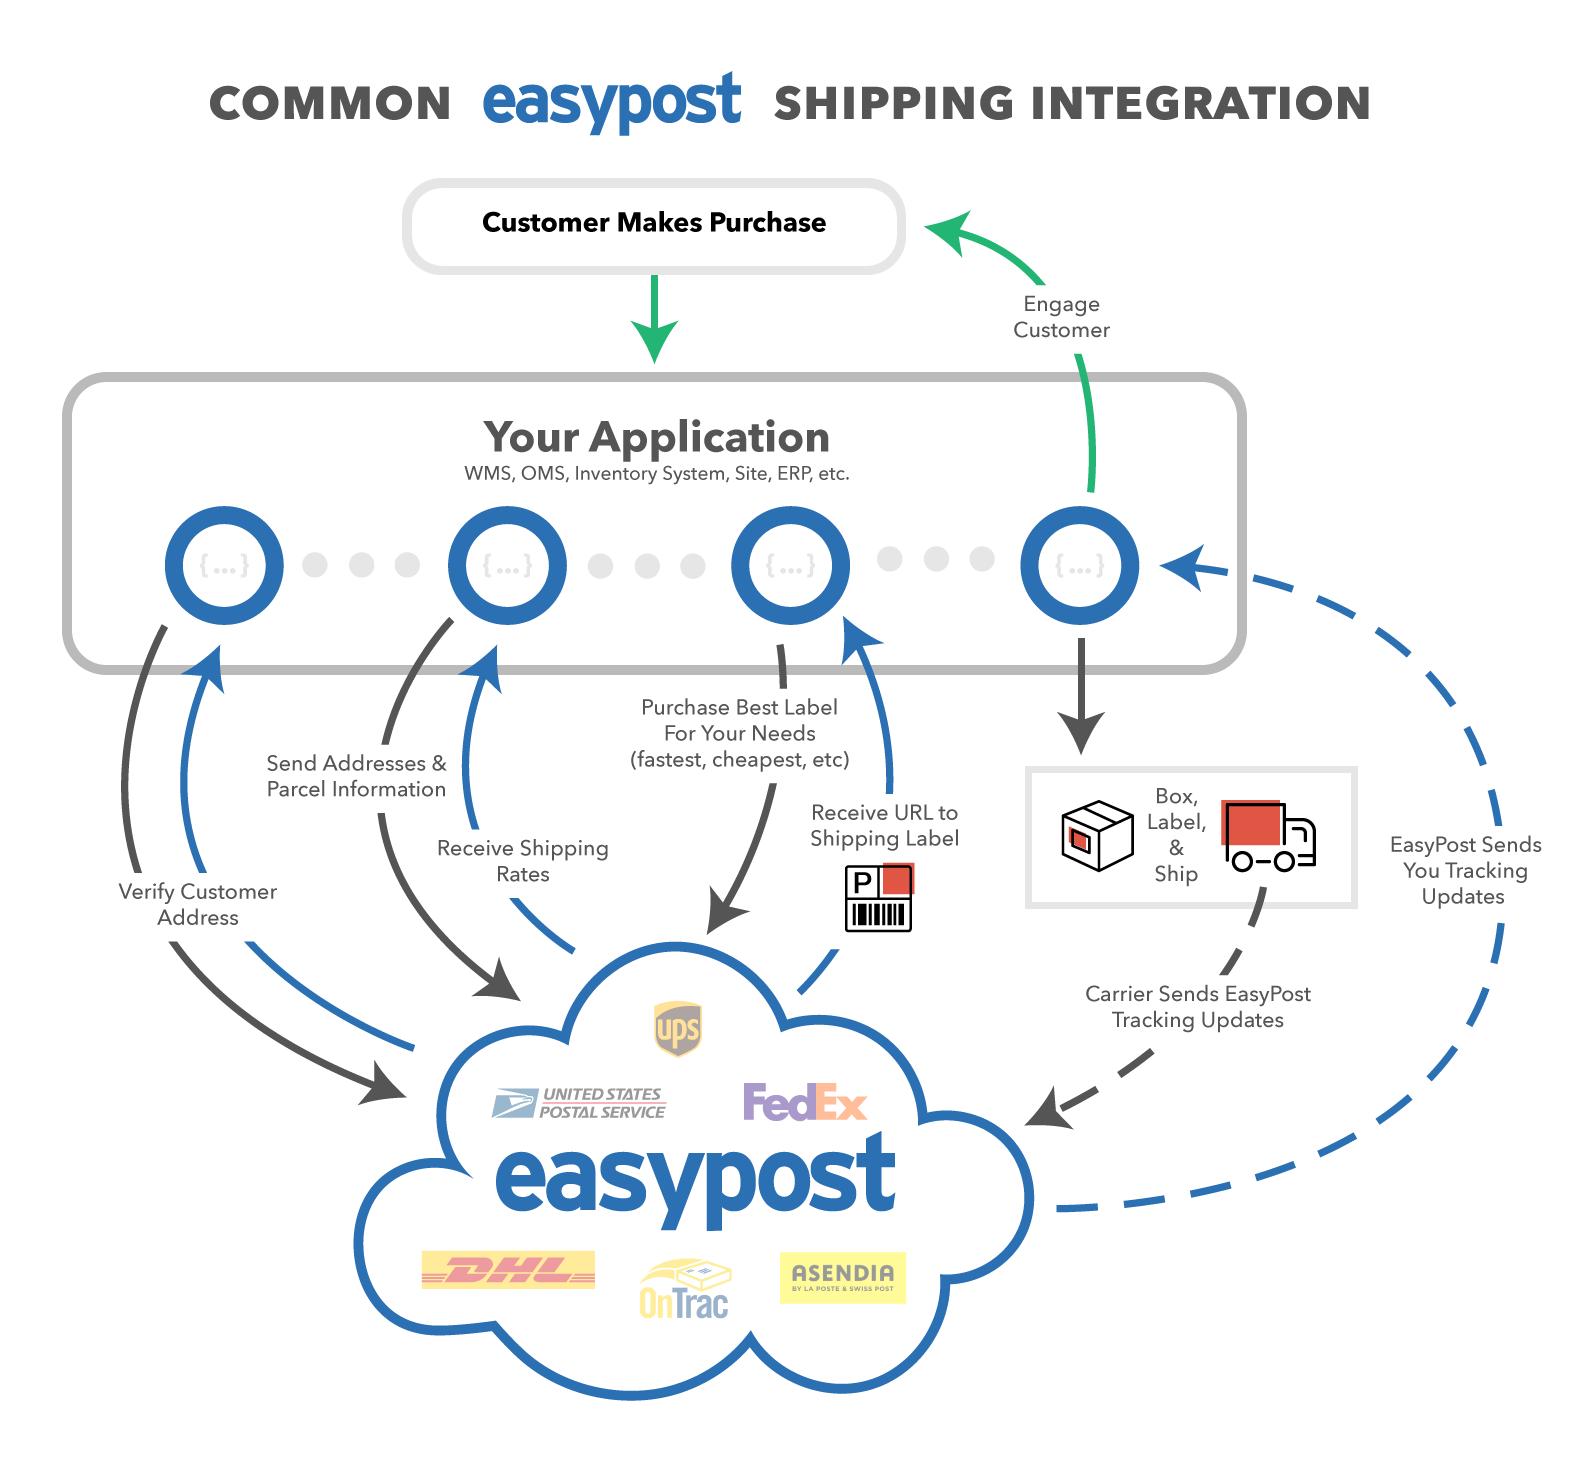 Common EasyPost Shipping Integration